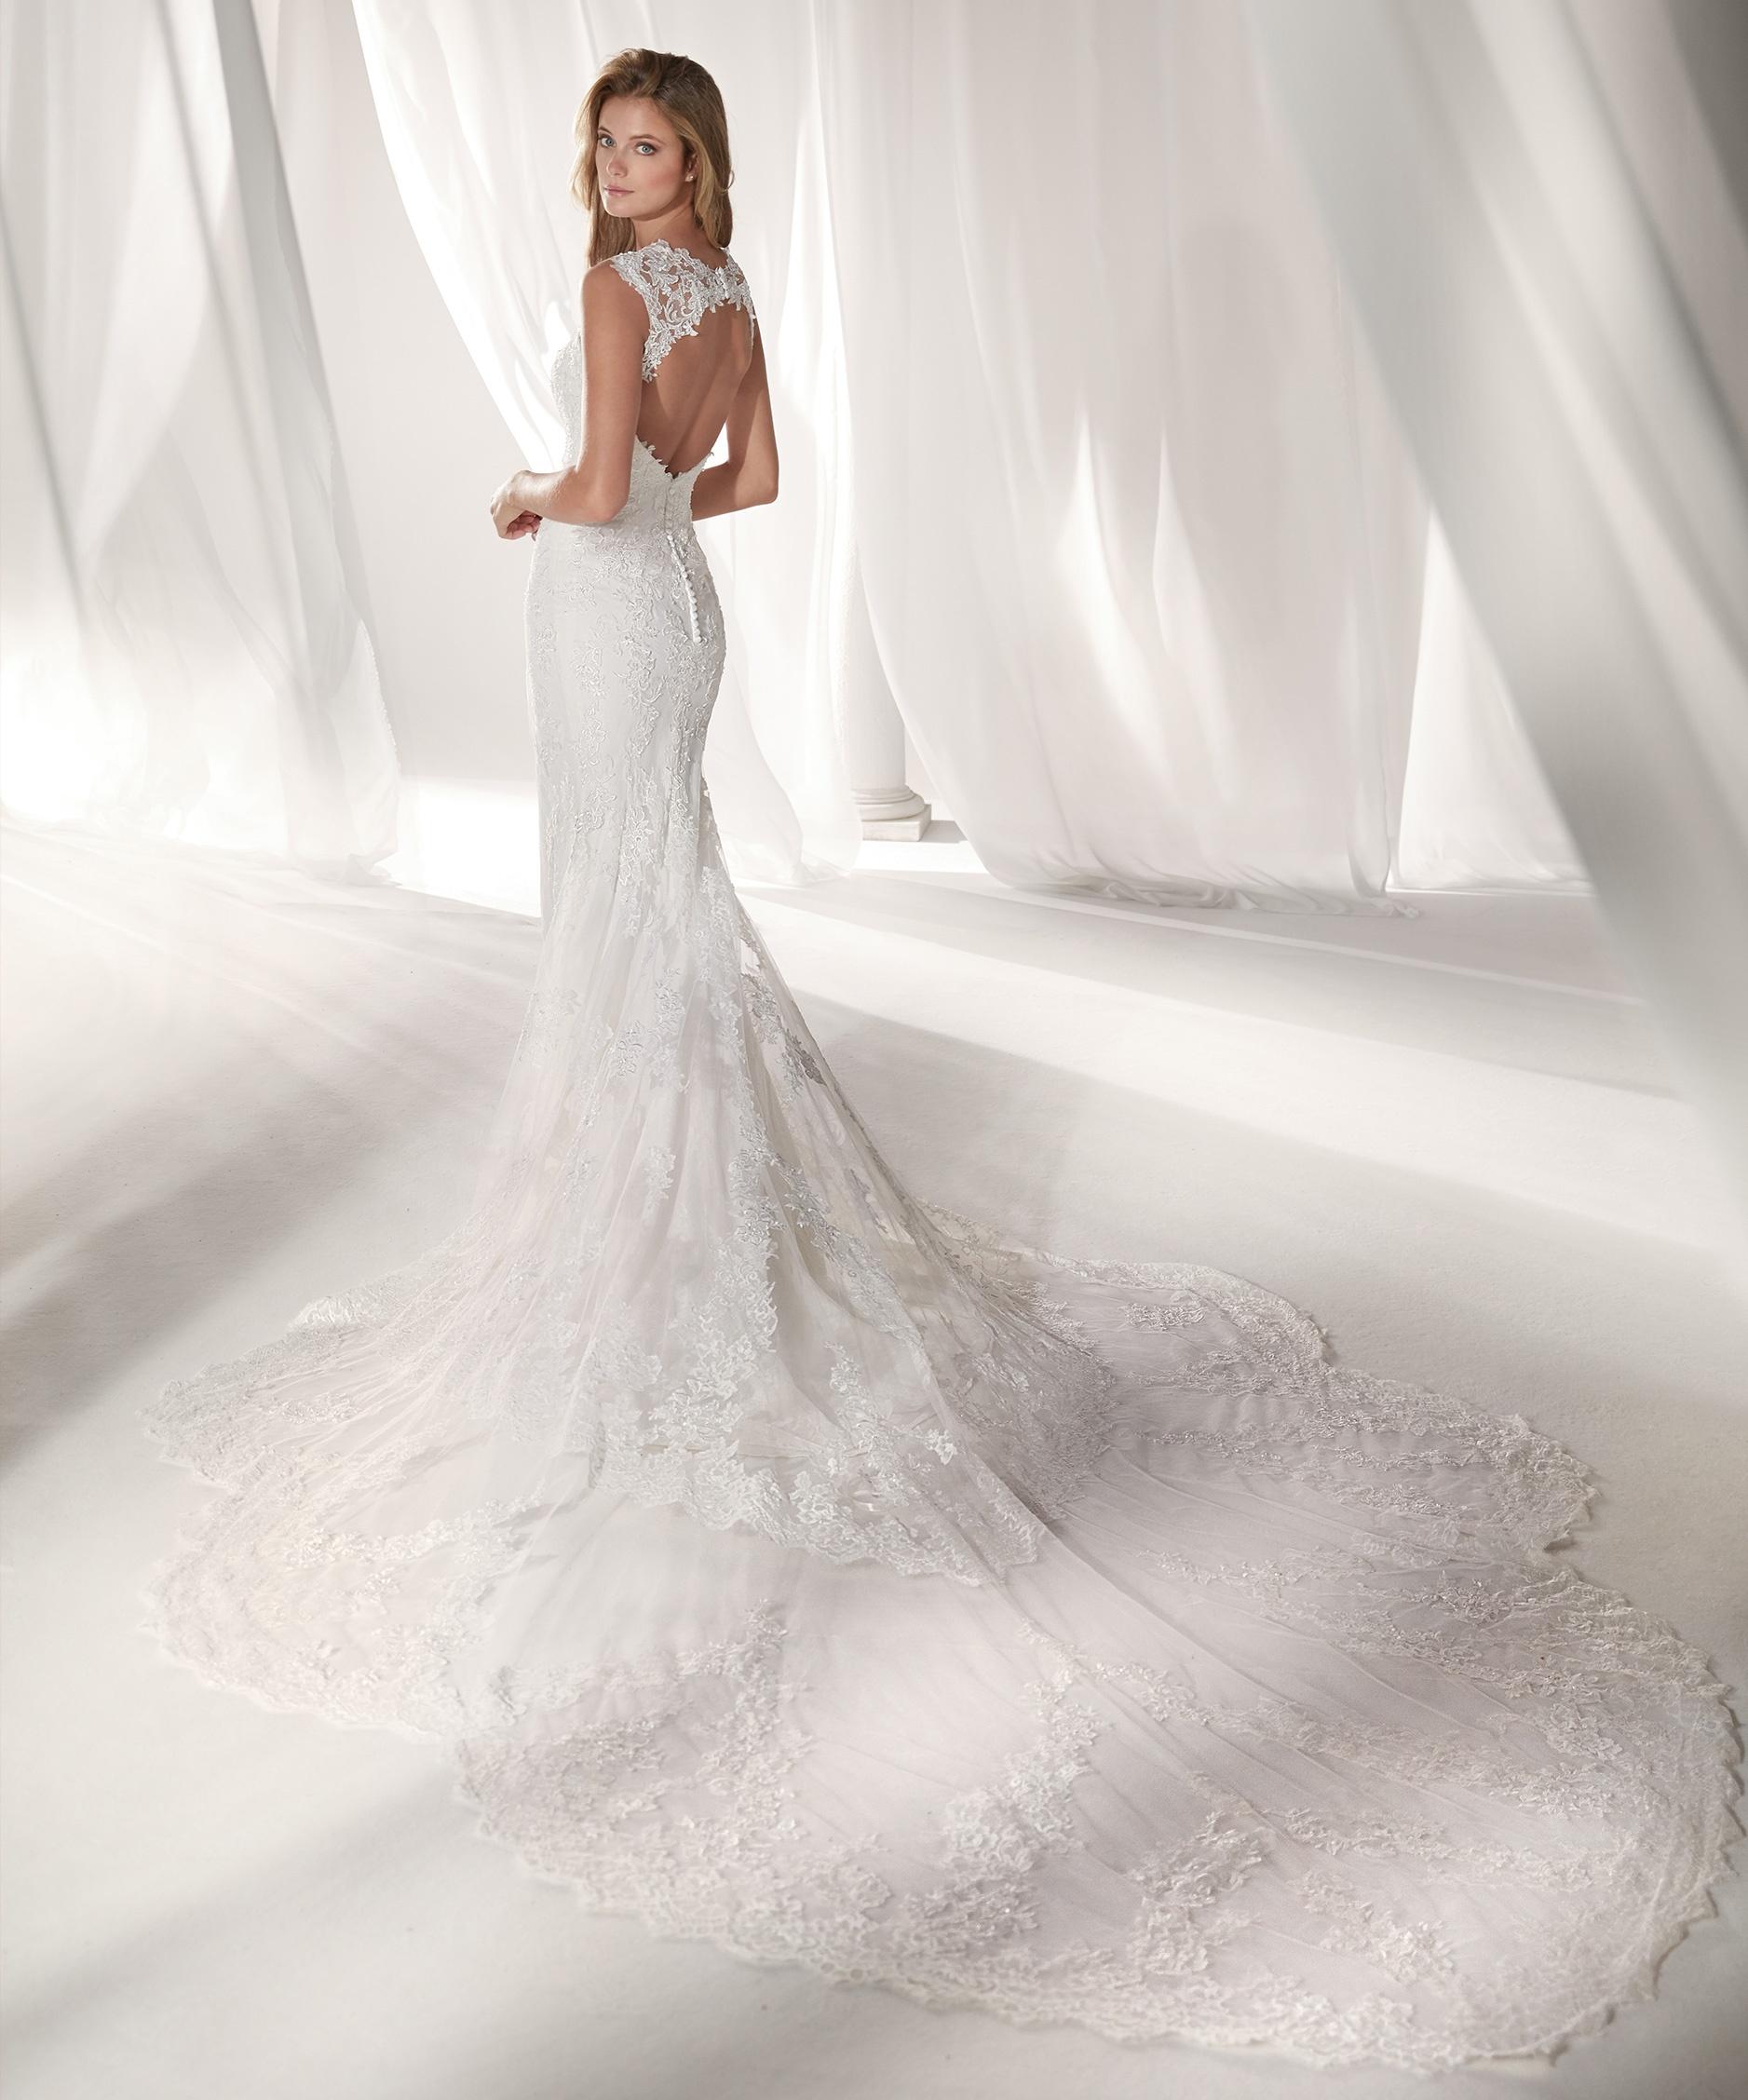 nicole-spose-NIAB19114-Nicole-moda-sposa-2019-51.jpg